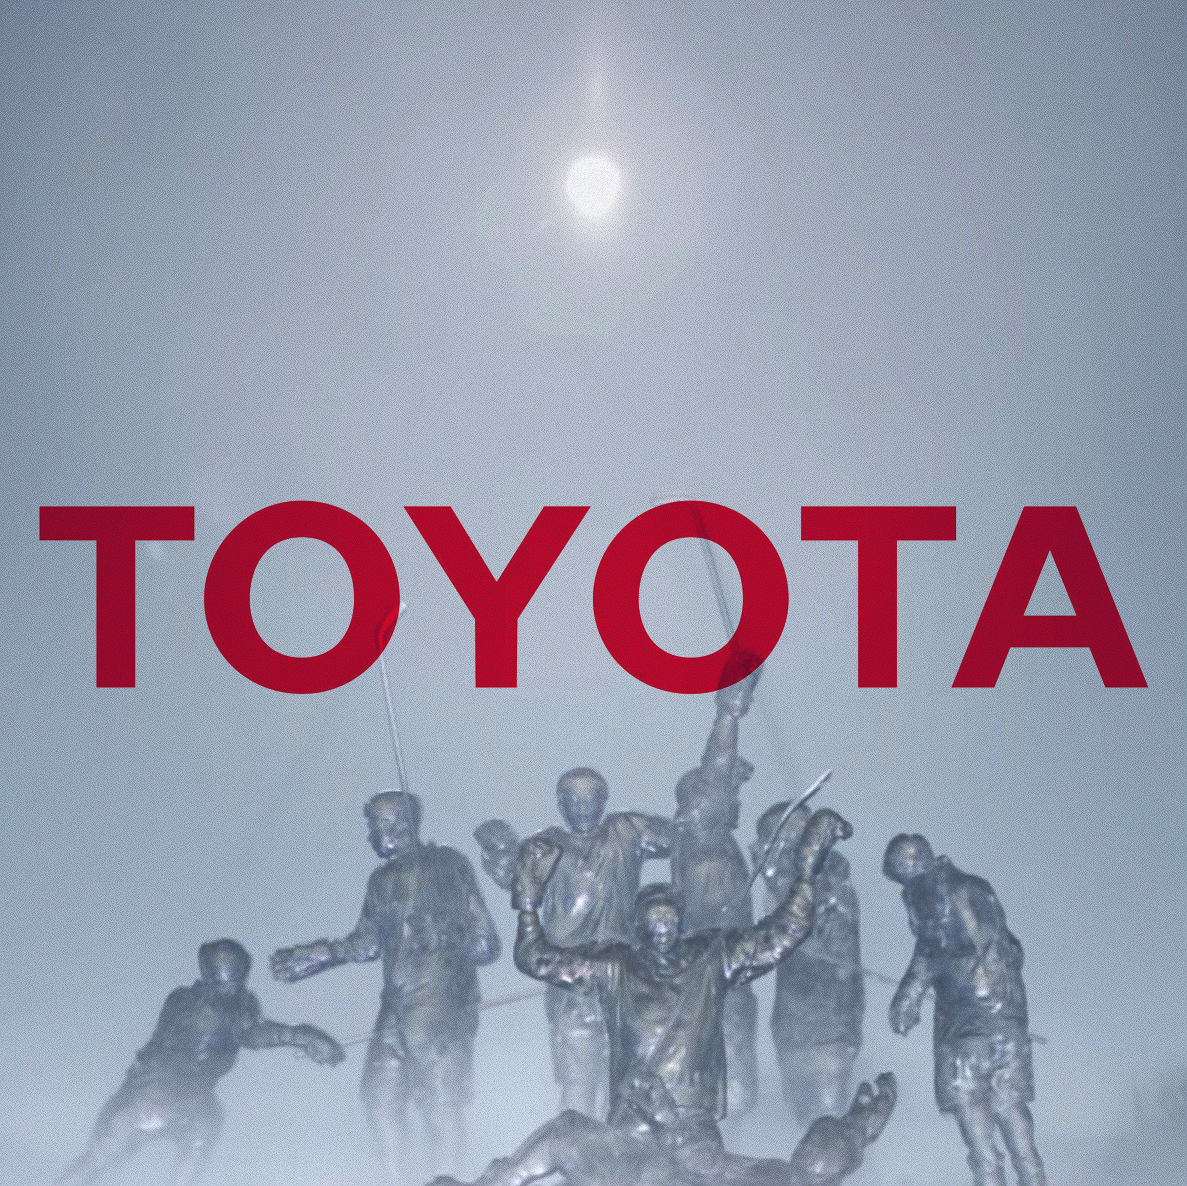 - Frozen | ToyotaHildur Guðnadóttir-- Musical Sound Design + Programming2018 MASA Awards FinalistBest Original Composition